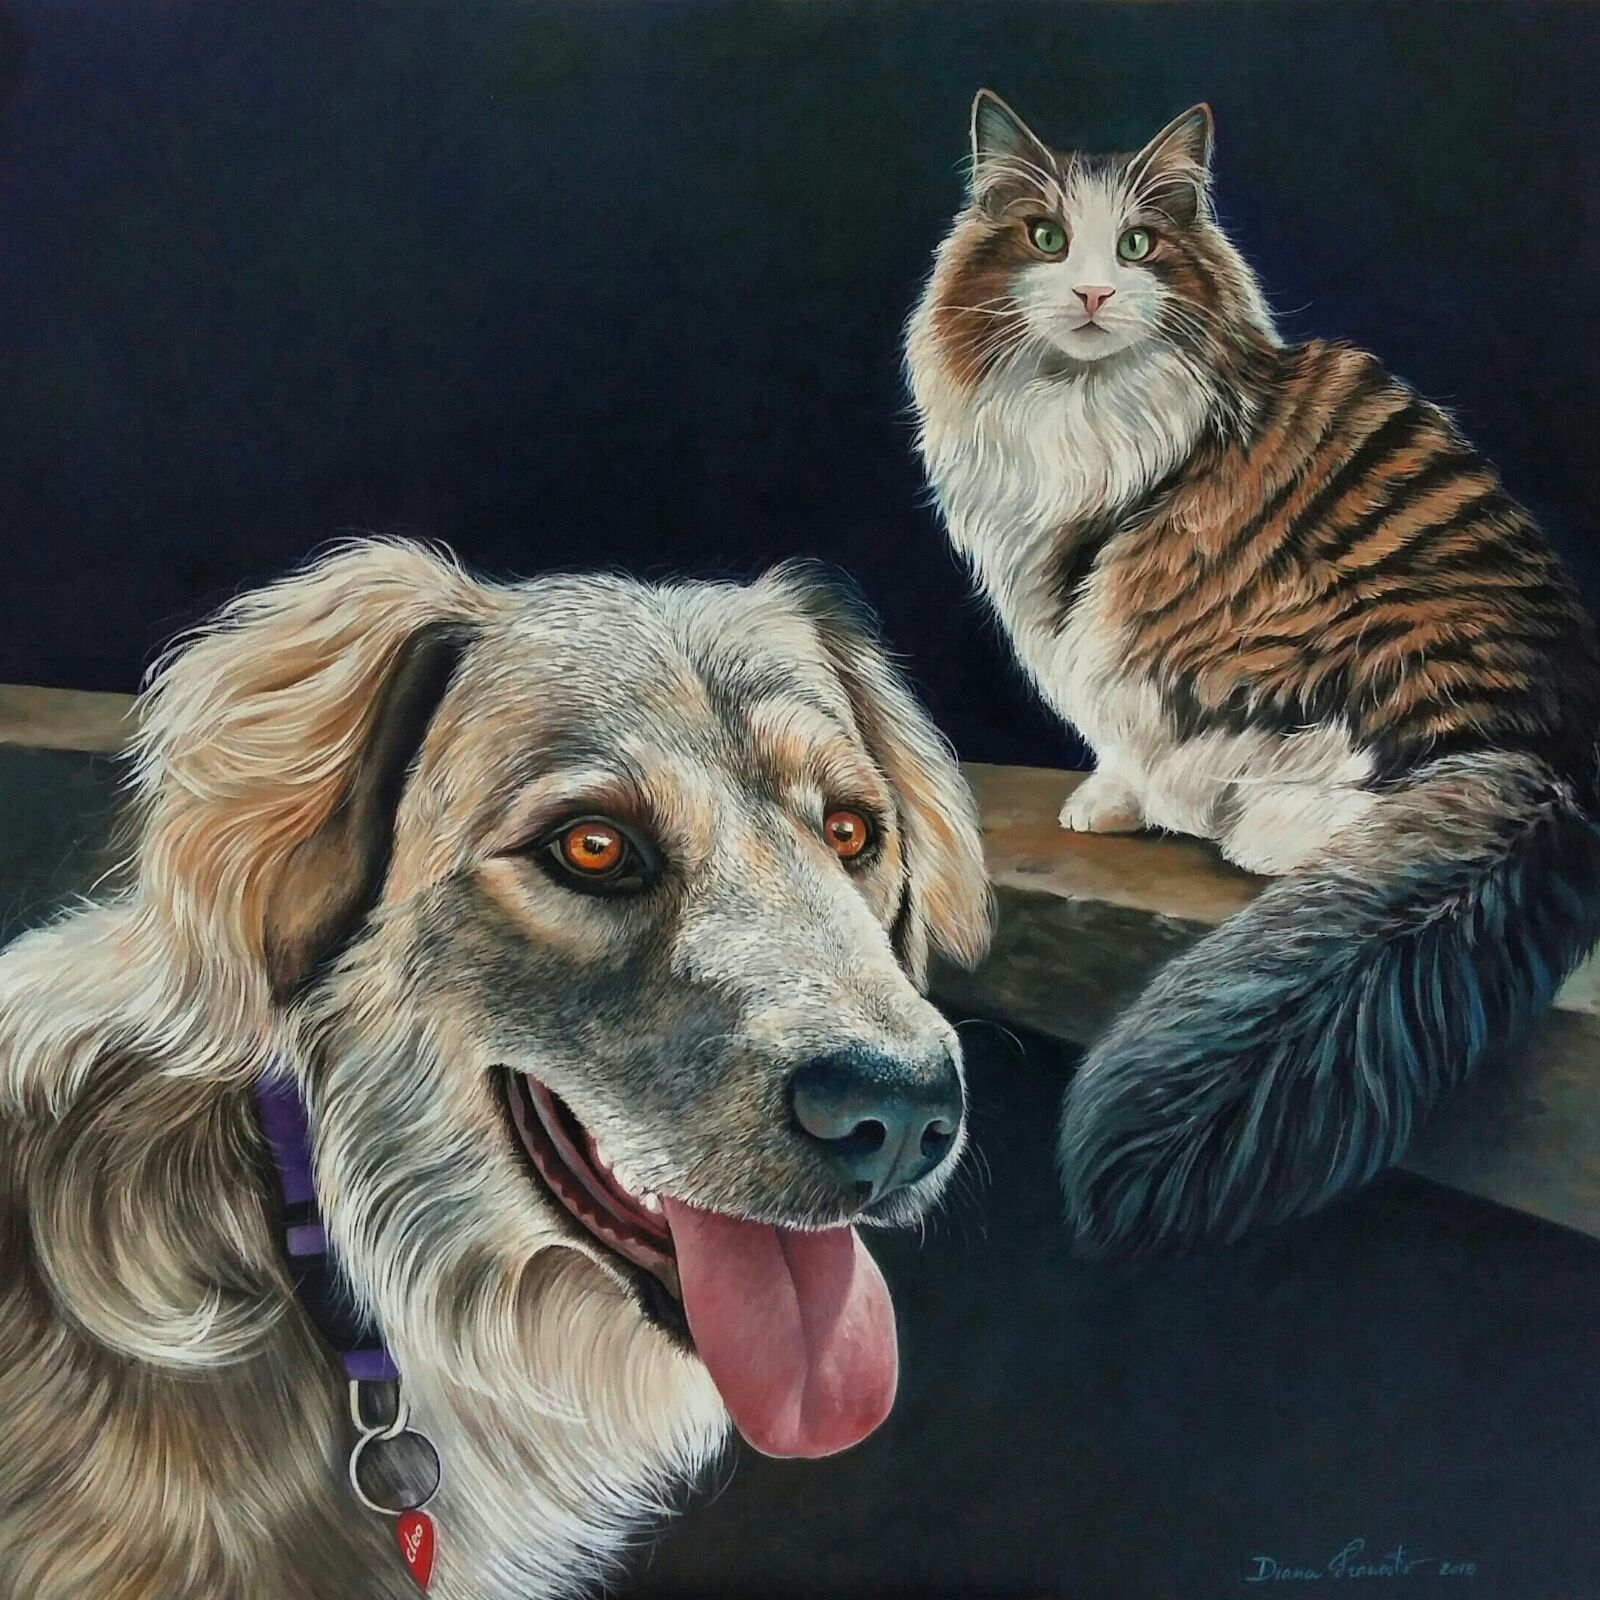 Cleopatra (cane) e Caio Giulio Cesare Gatto)